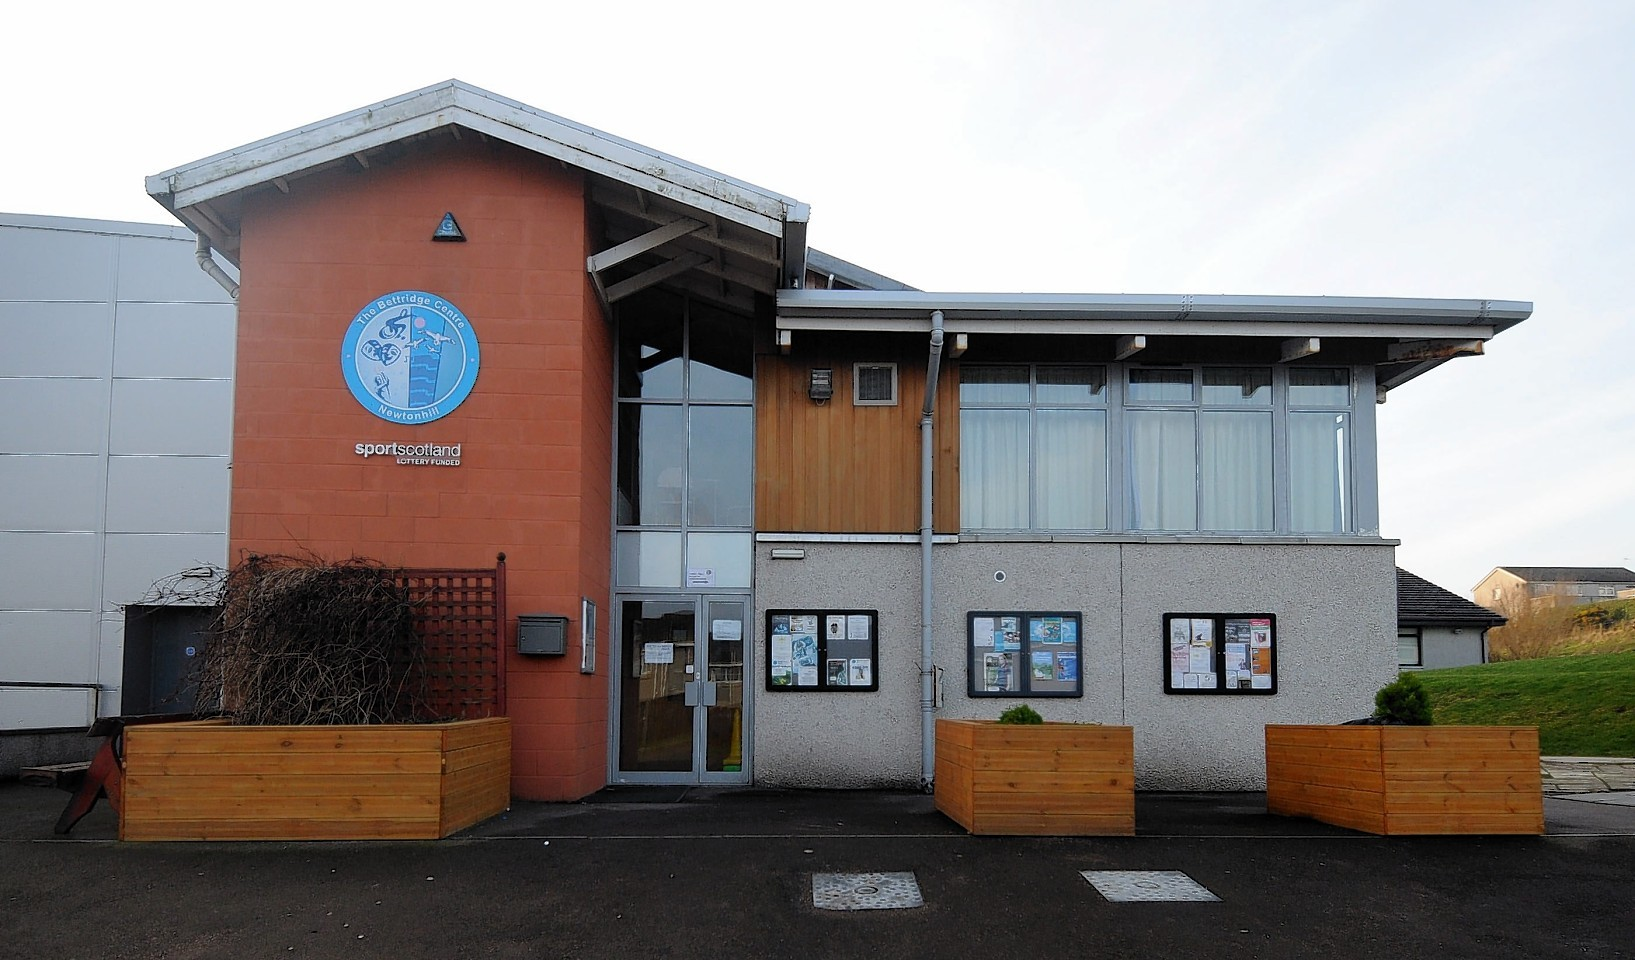 The Bettridge Centre in Newtonhill,